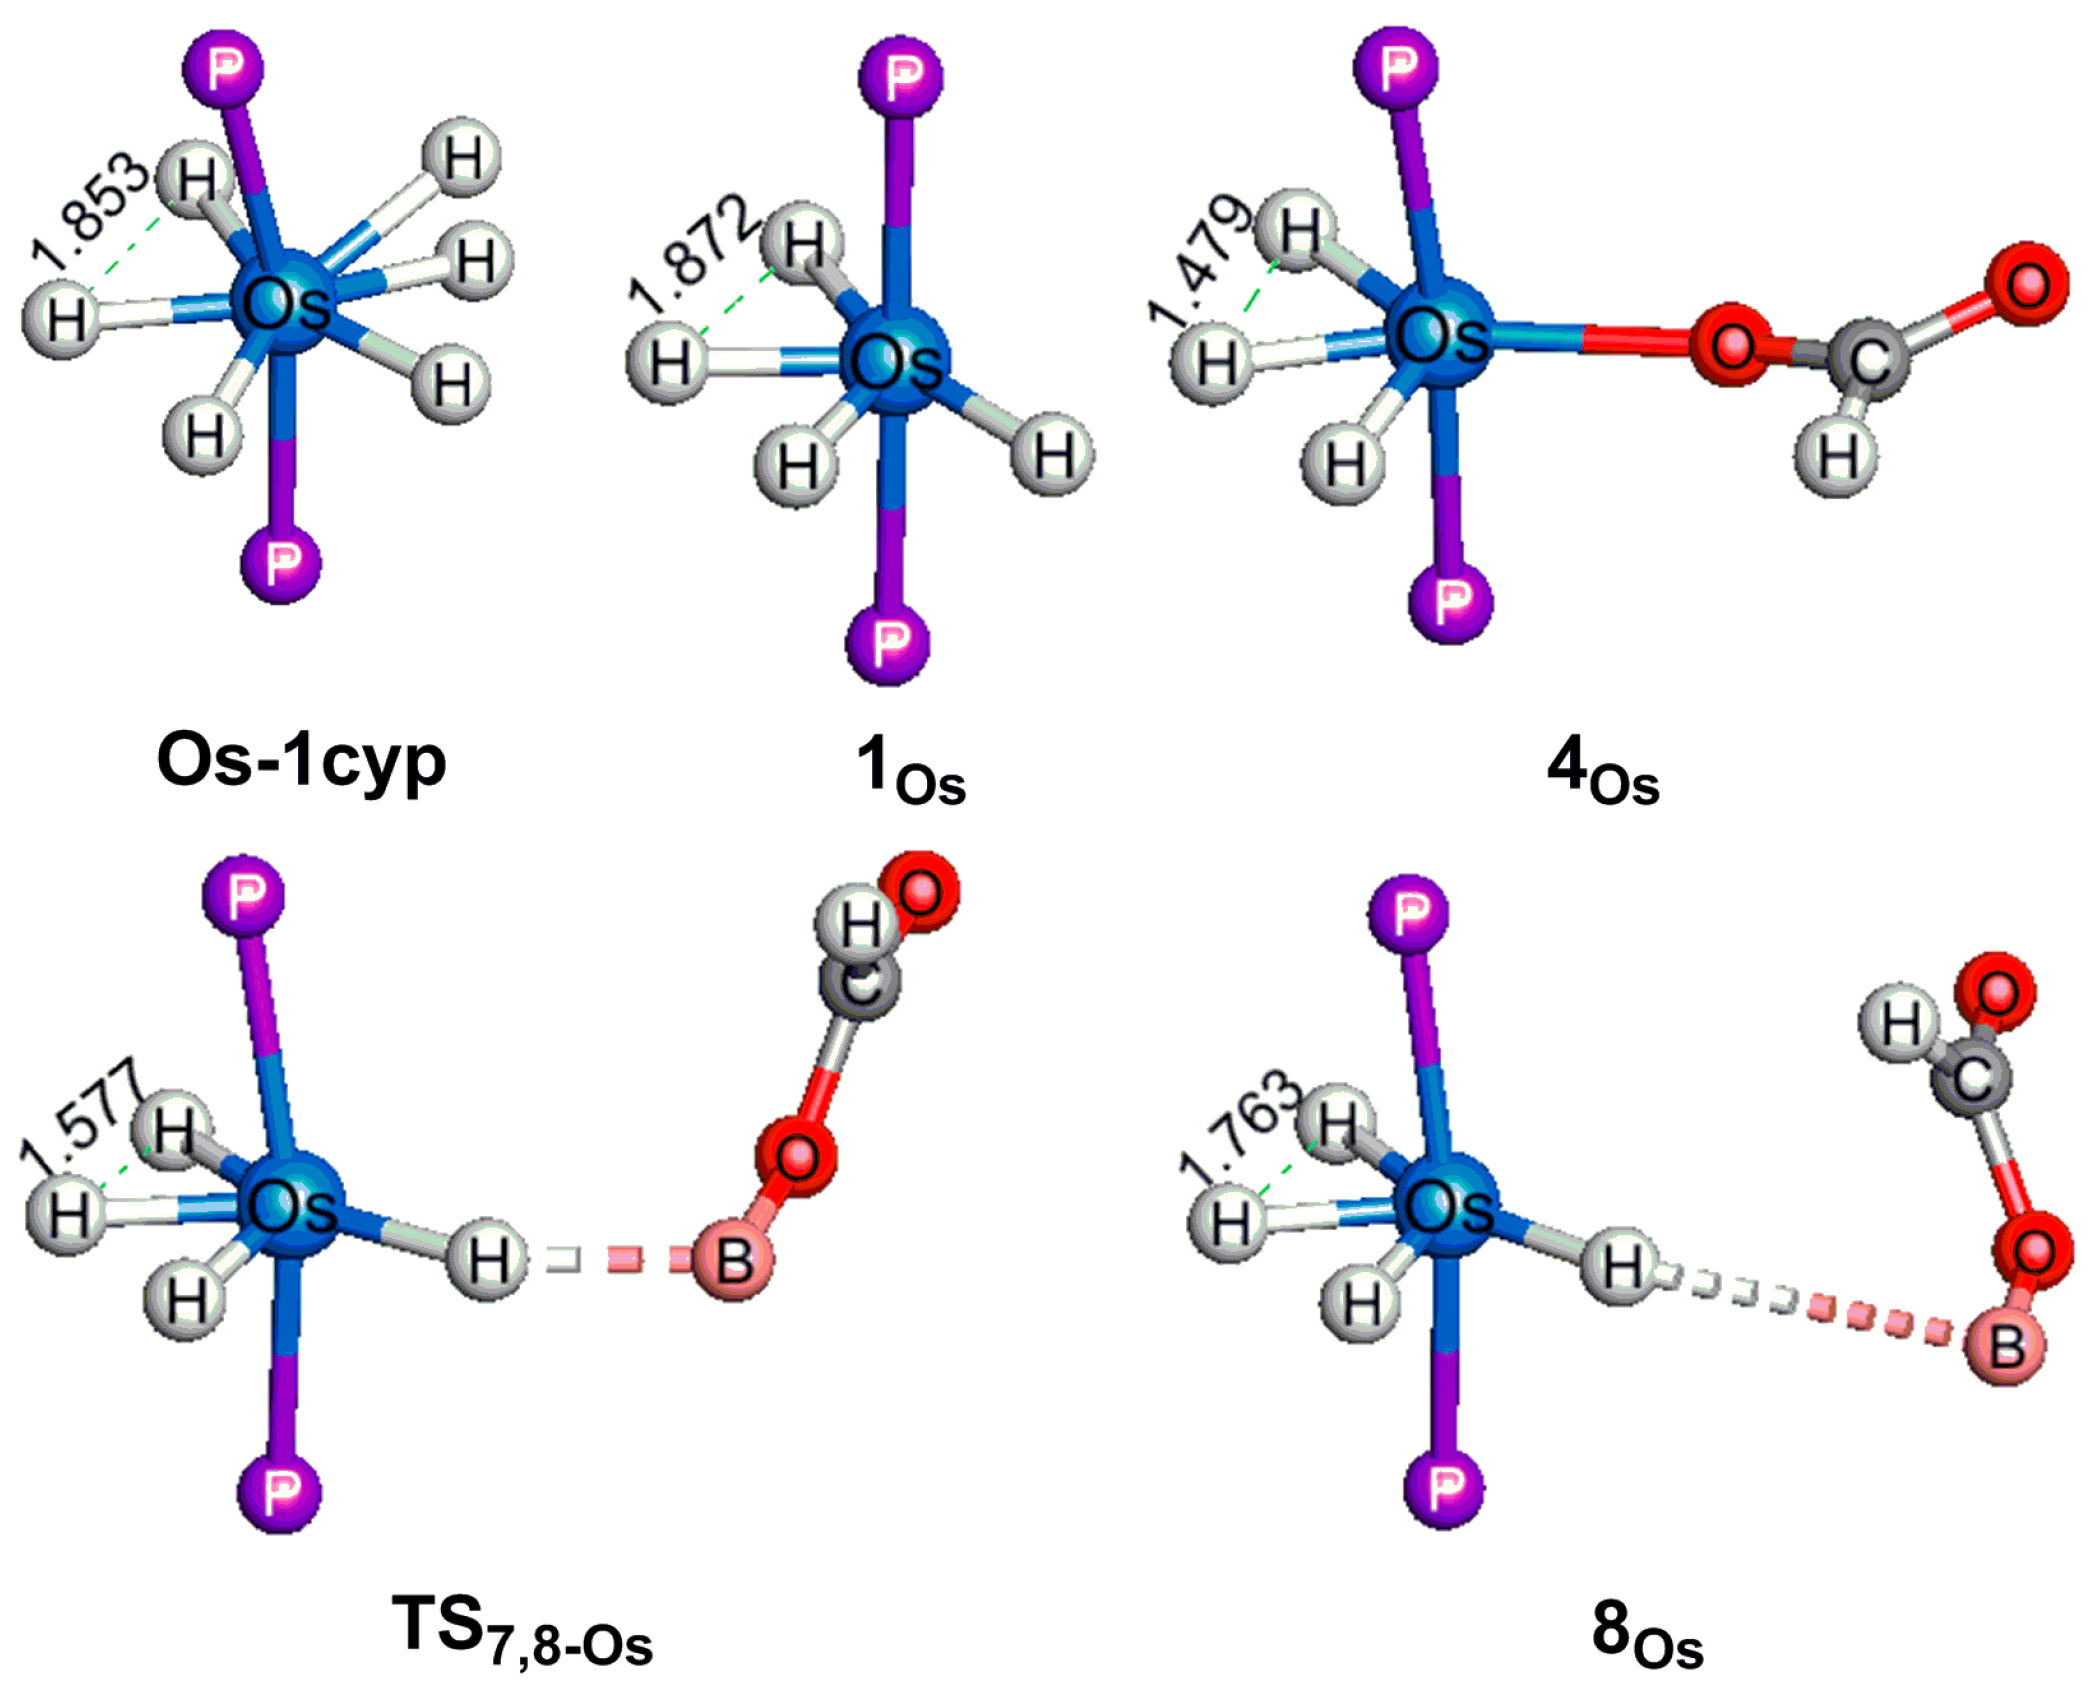 sigma bond metathesis reaction Smith et al report the iridium-catalyzed reaction using σ-bond metathesis type cp 2 scsihrr' sigma-bond metathesis reactions and catalytic.